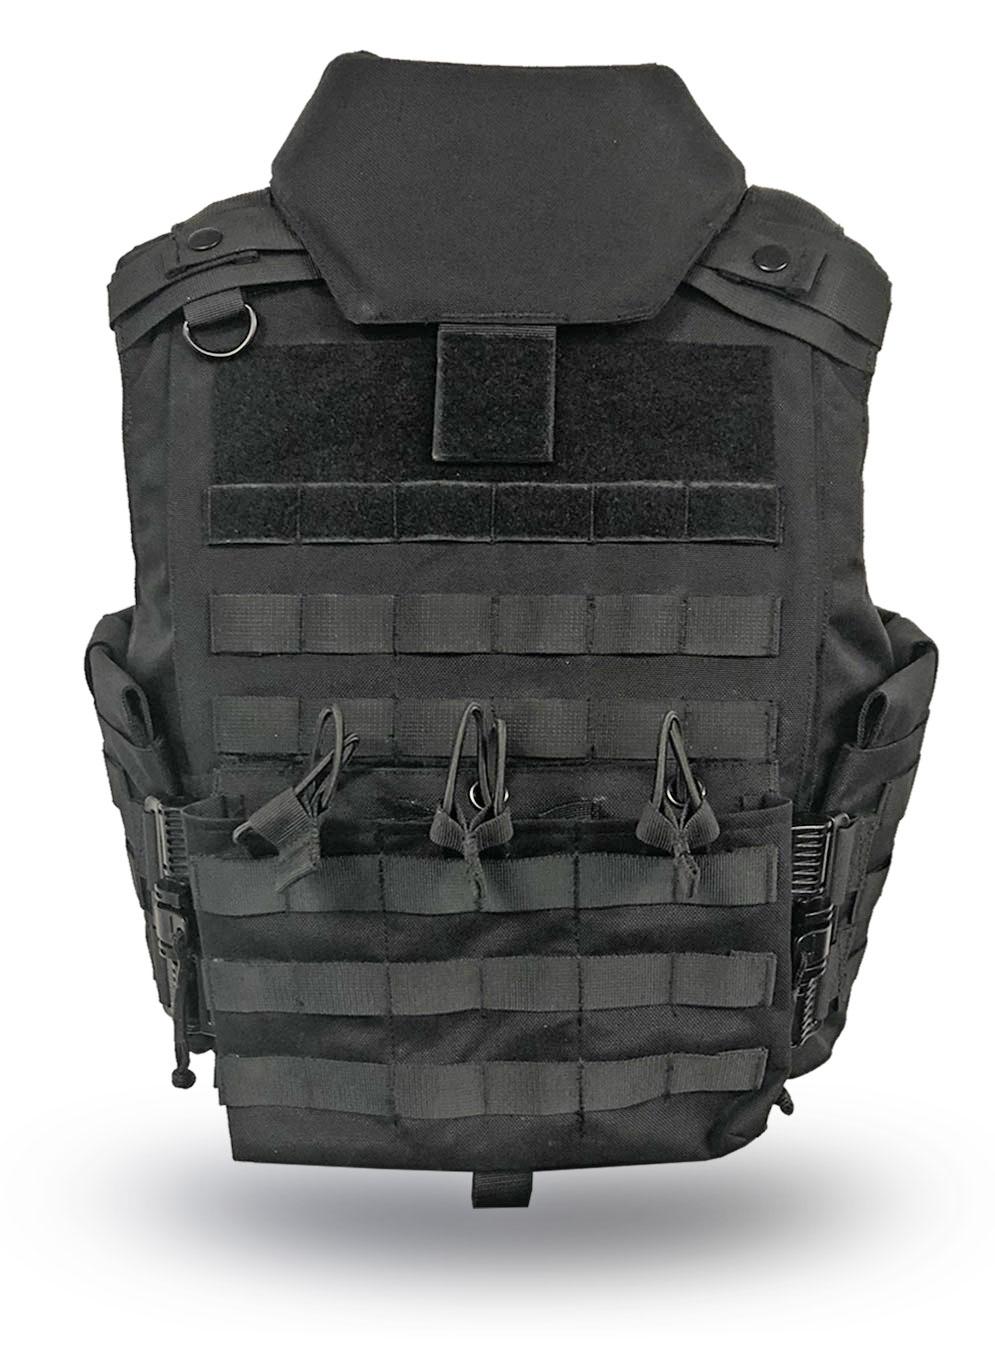 Vest body armor lrg 1571 battle isabliss investment companies